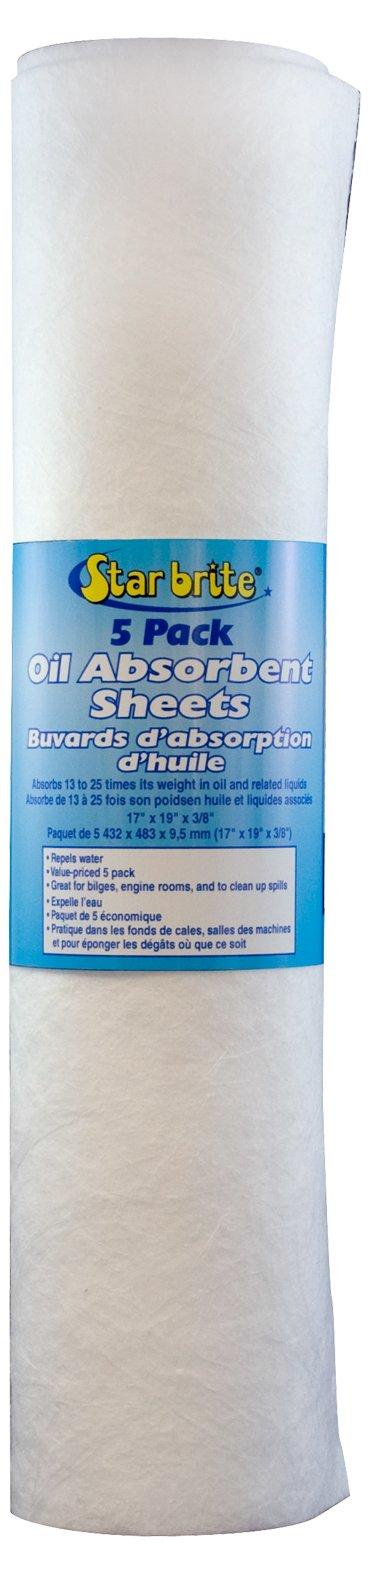 Star brite Bilge Oil Pads 5 Pack - 5 Pack